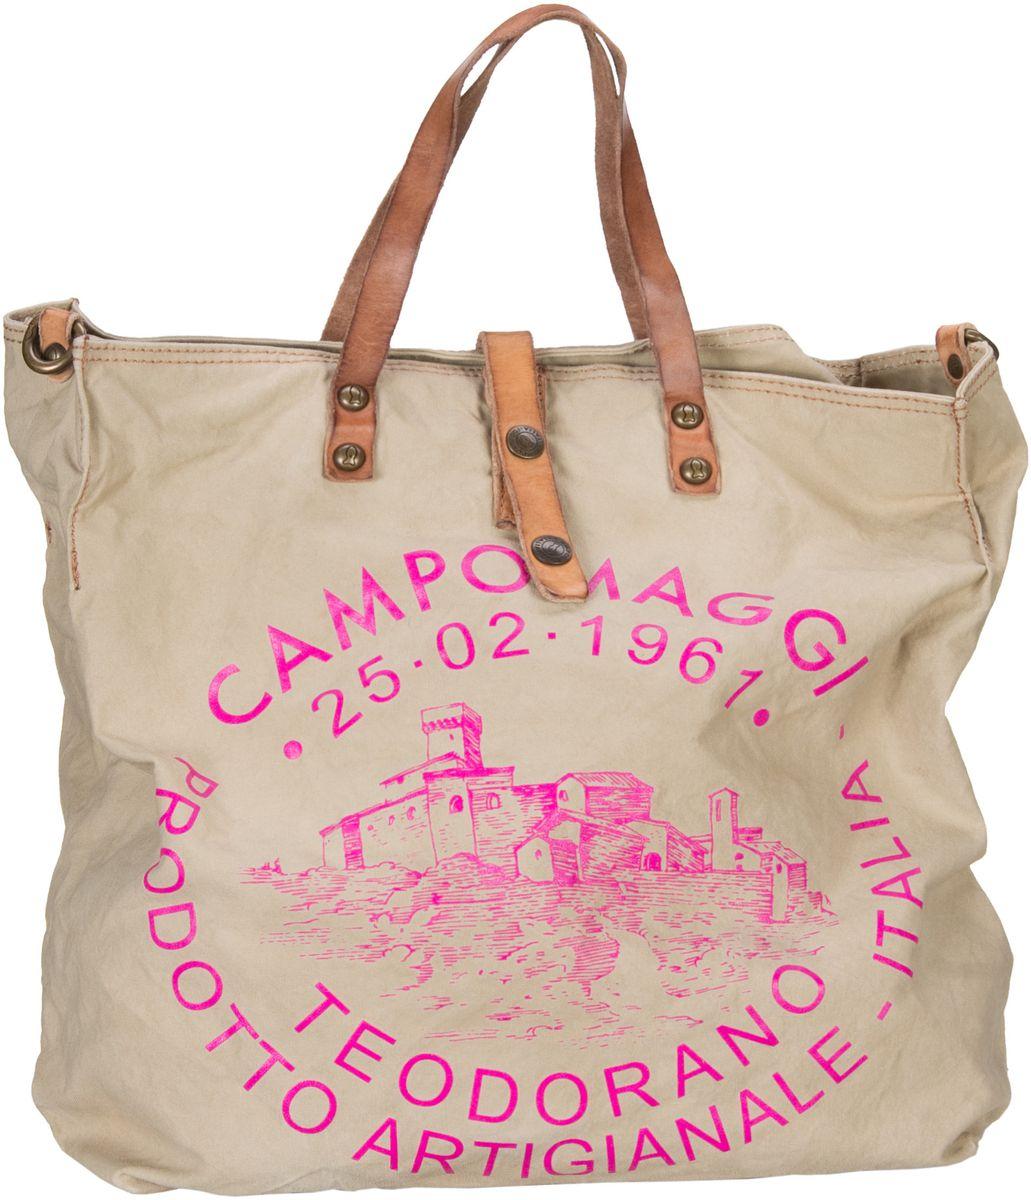 Handtasche Lambro Canvas Bag Beige/Stampa Fuxia